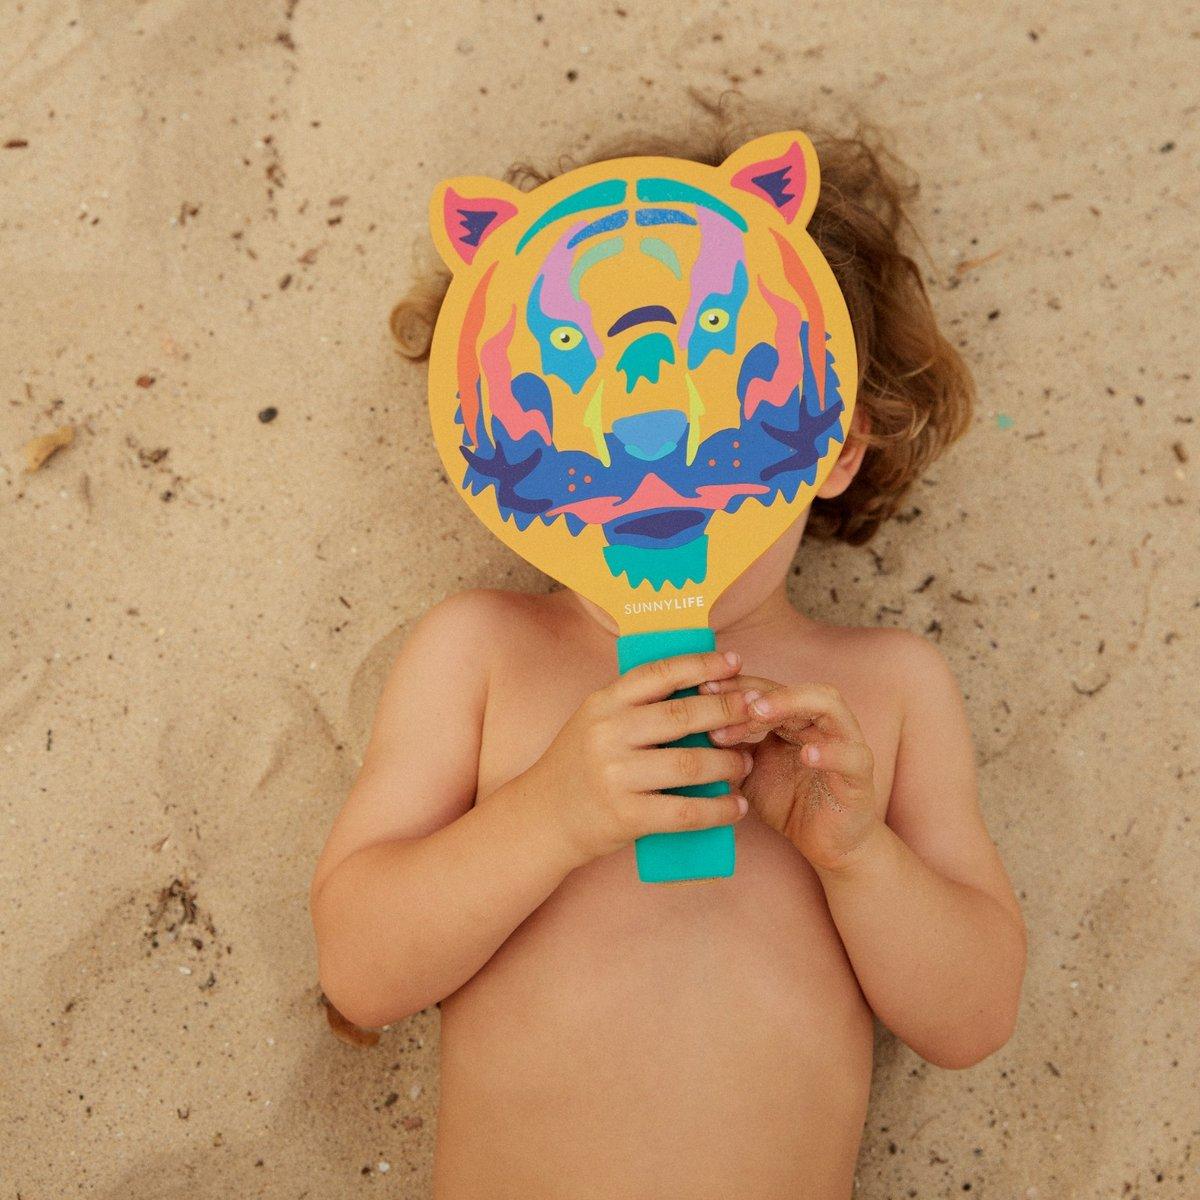 Style Report Summer 2020: Sunnylife Australia